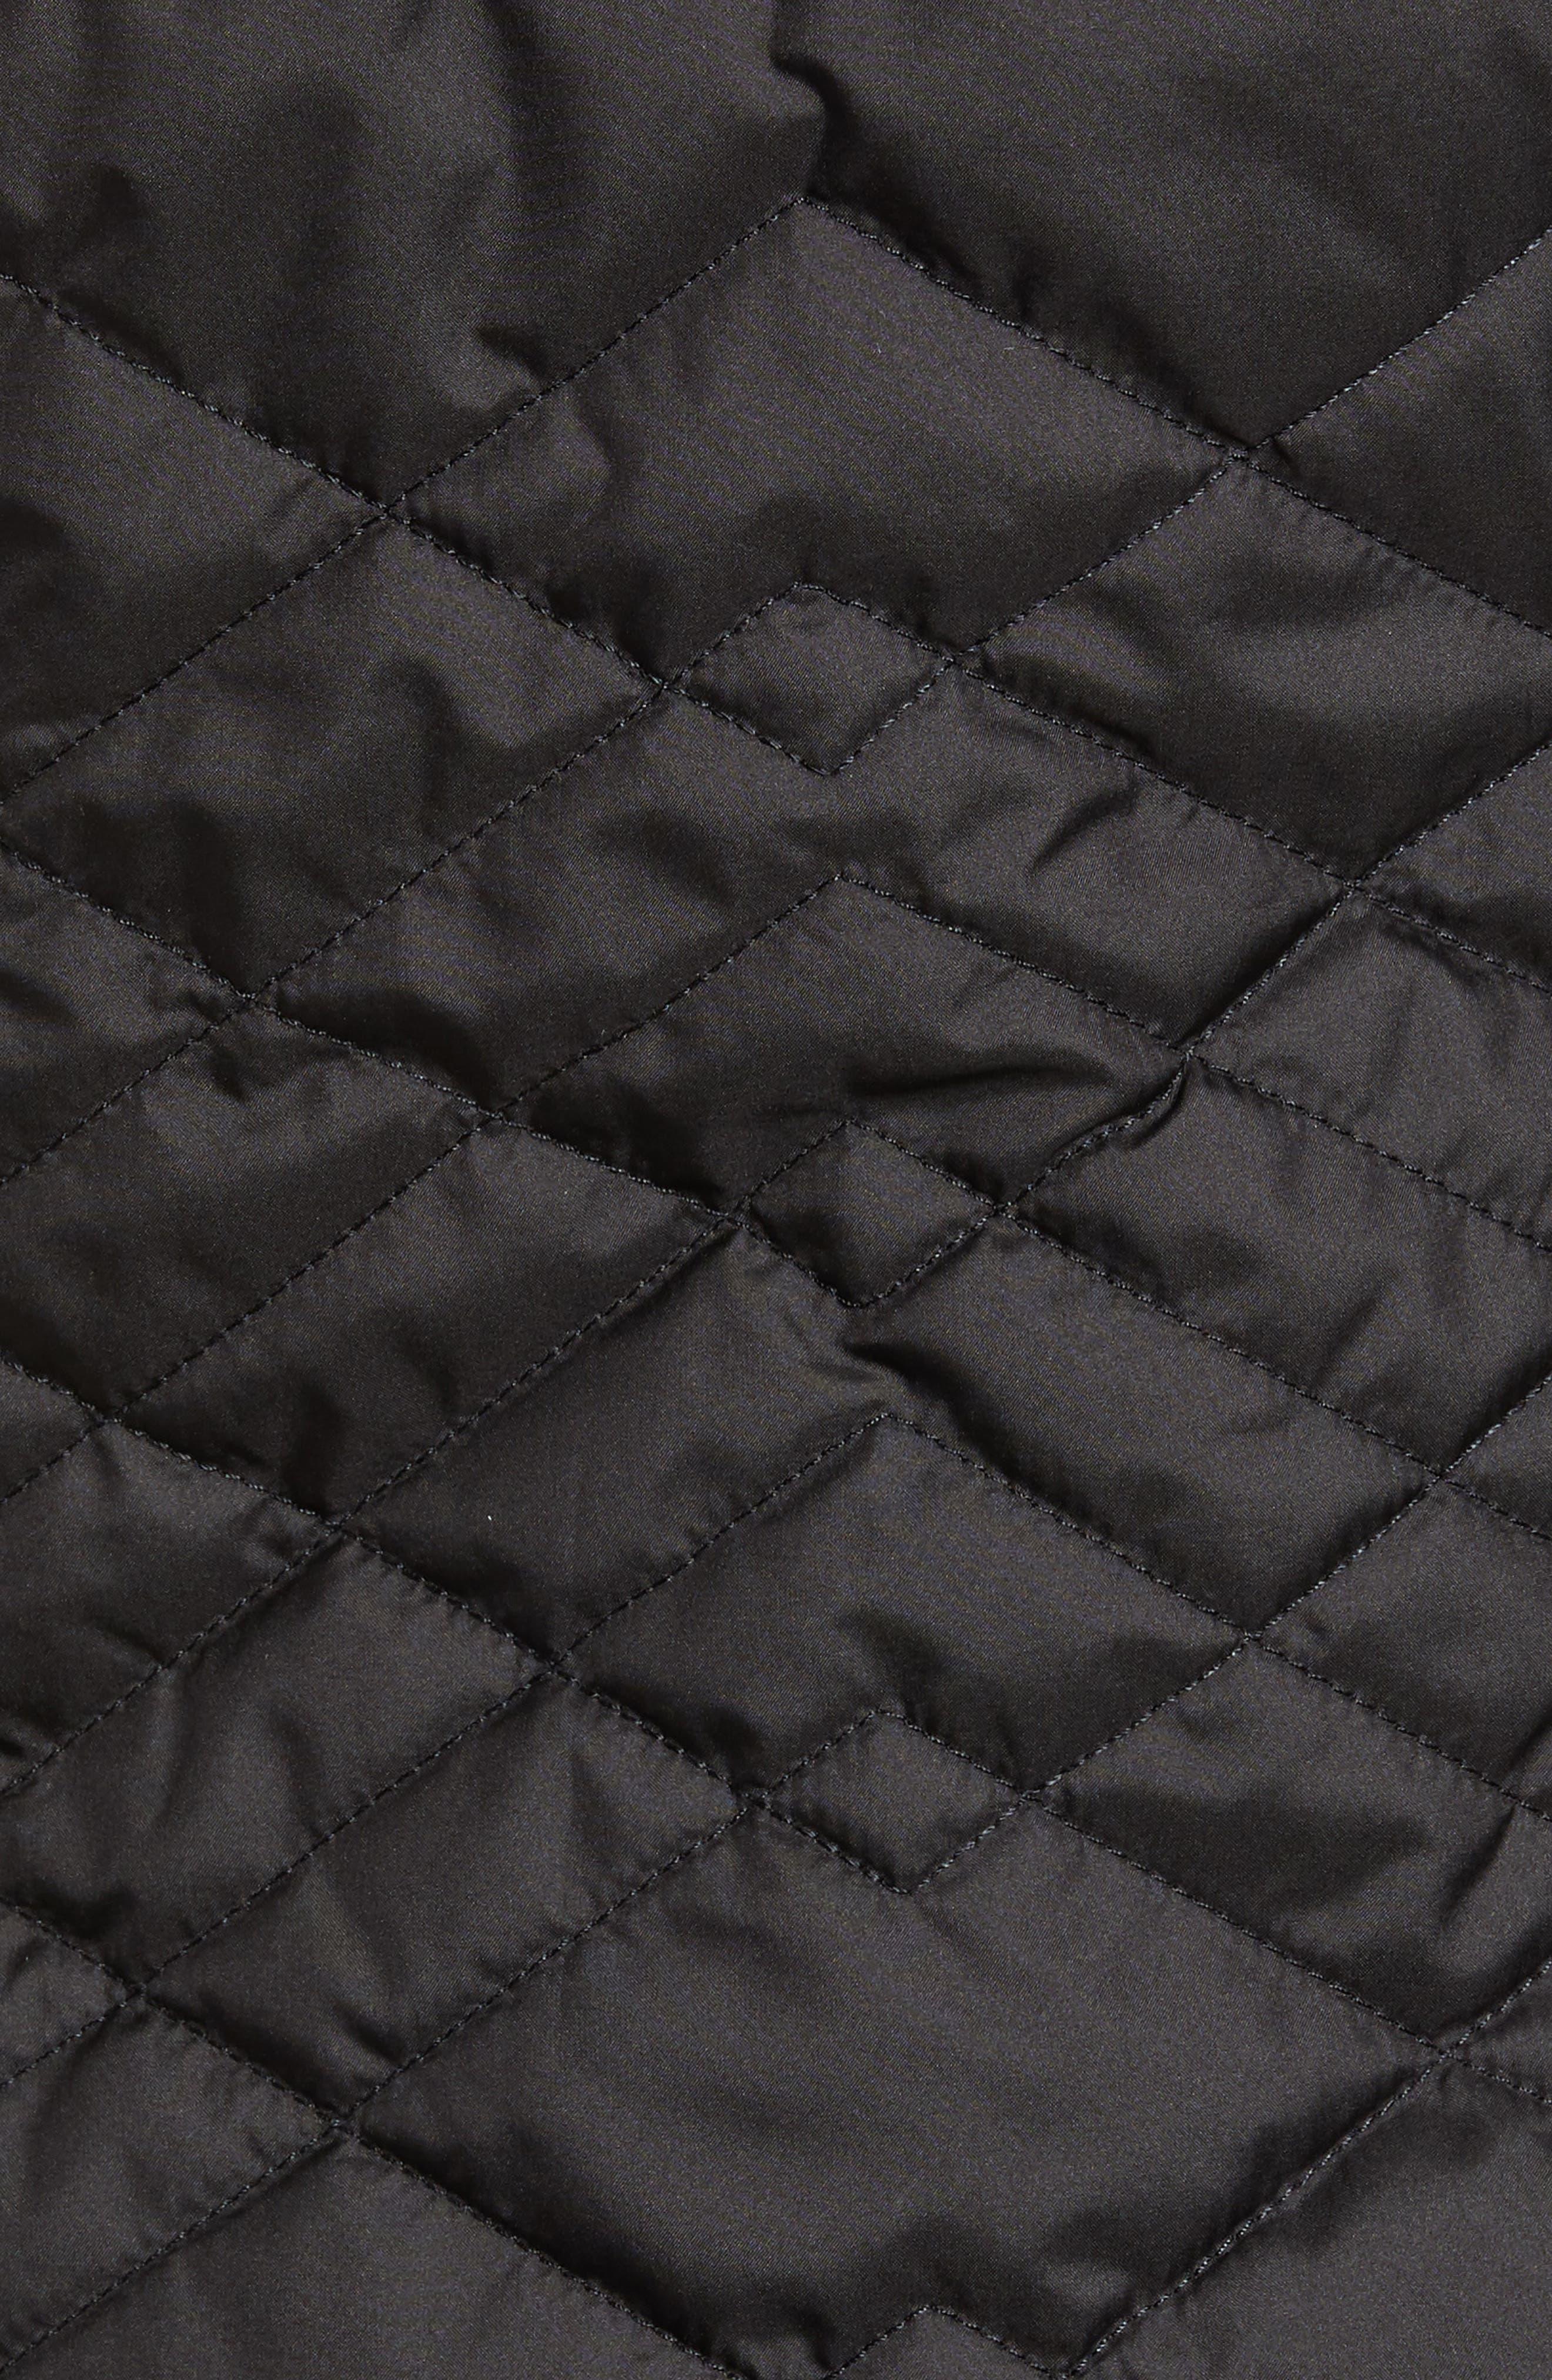 THE NORTH FACE, Mossbud Reversible Heatseeker<sup>™</sup> Wind Resistant Jacket, Alternate thumbnail 7, color, TNF BLACK